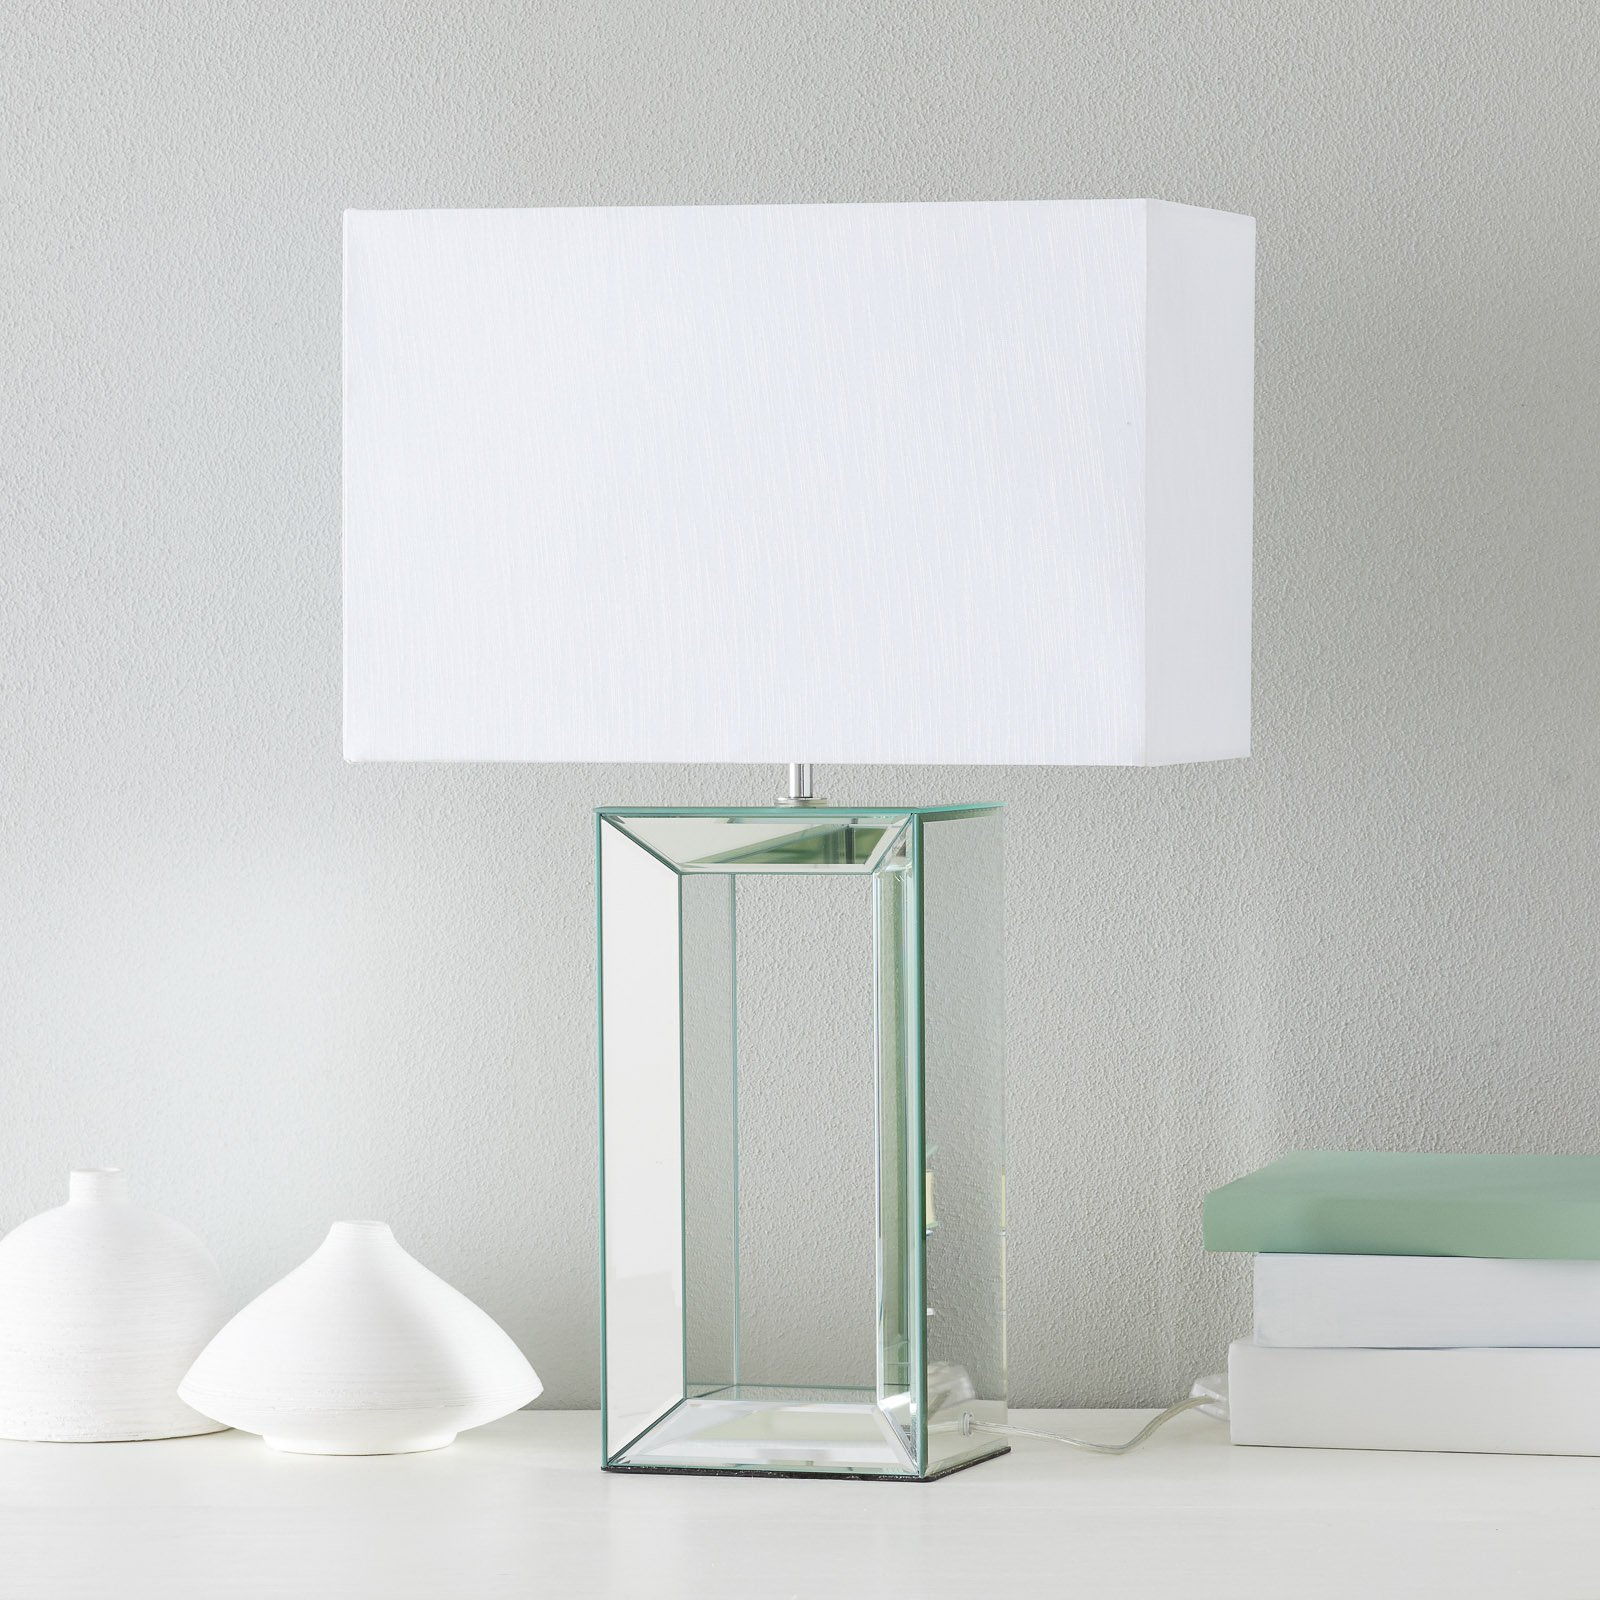 Stilfull bordlampe Reflections 58 cm